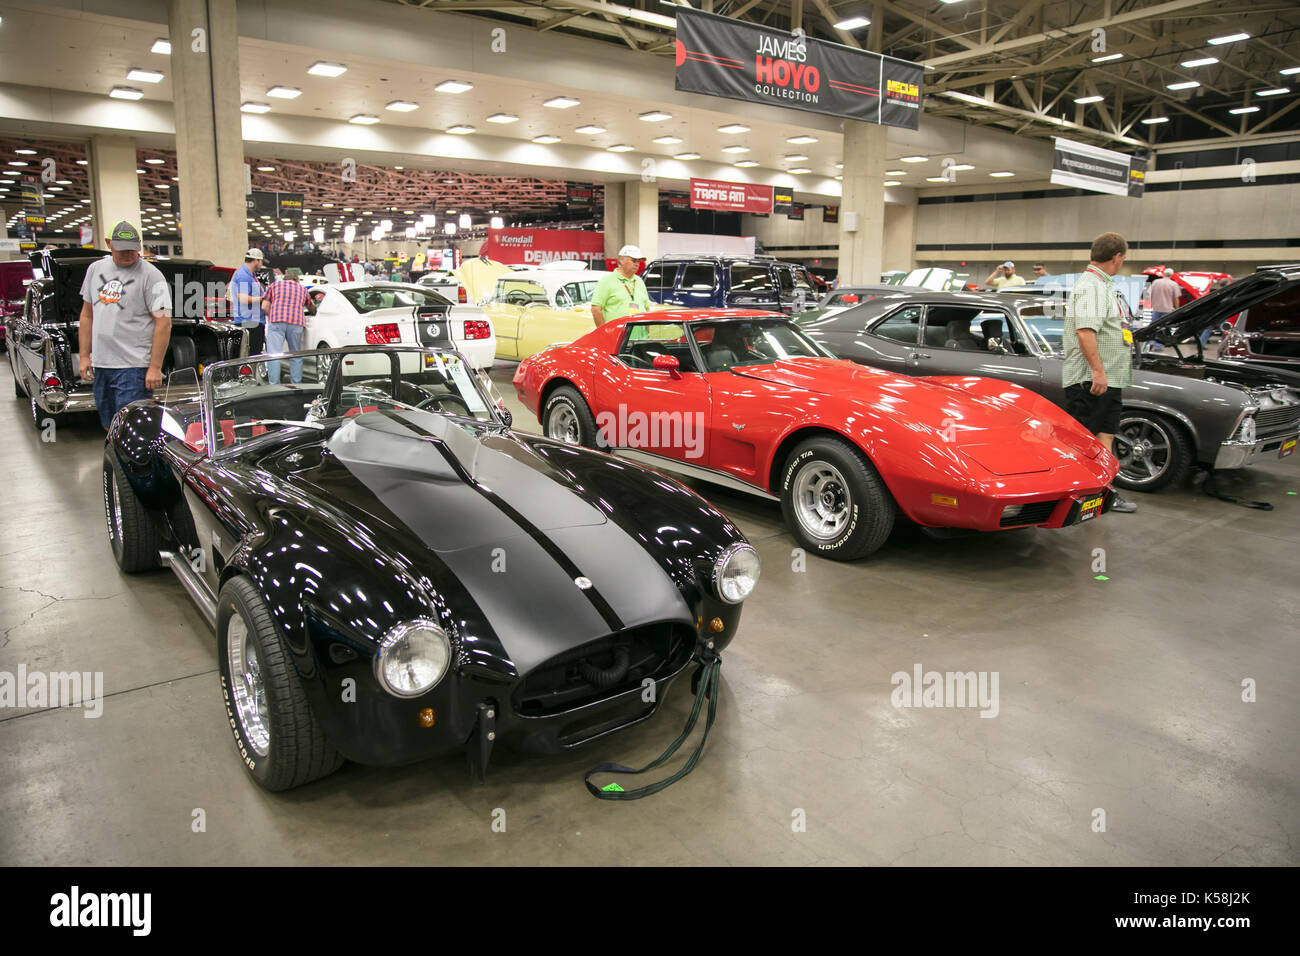 Car Auction Stock Photos & Car Auction Stock Images - Alamy